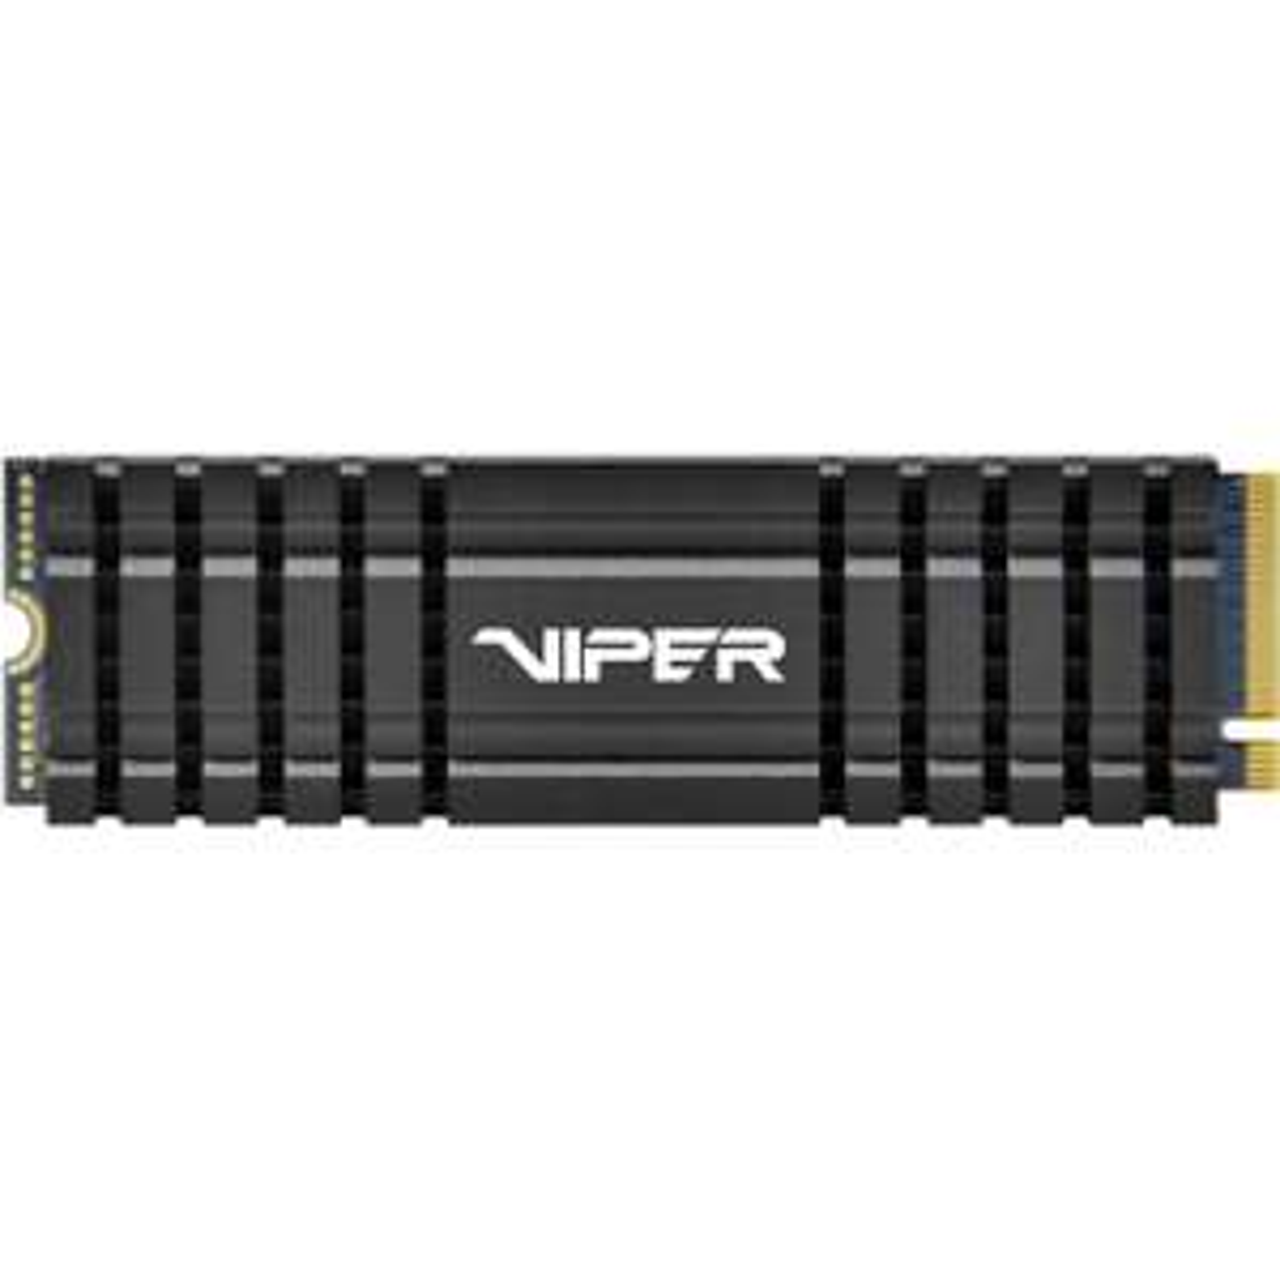 512GB M.2 NVMe SSD Patriot Viper VPN100 im Mindstar (Gratisversand)